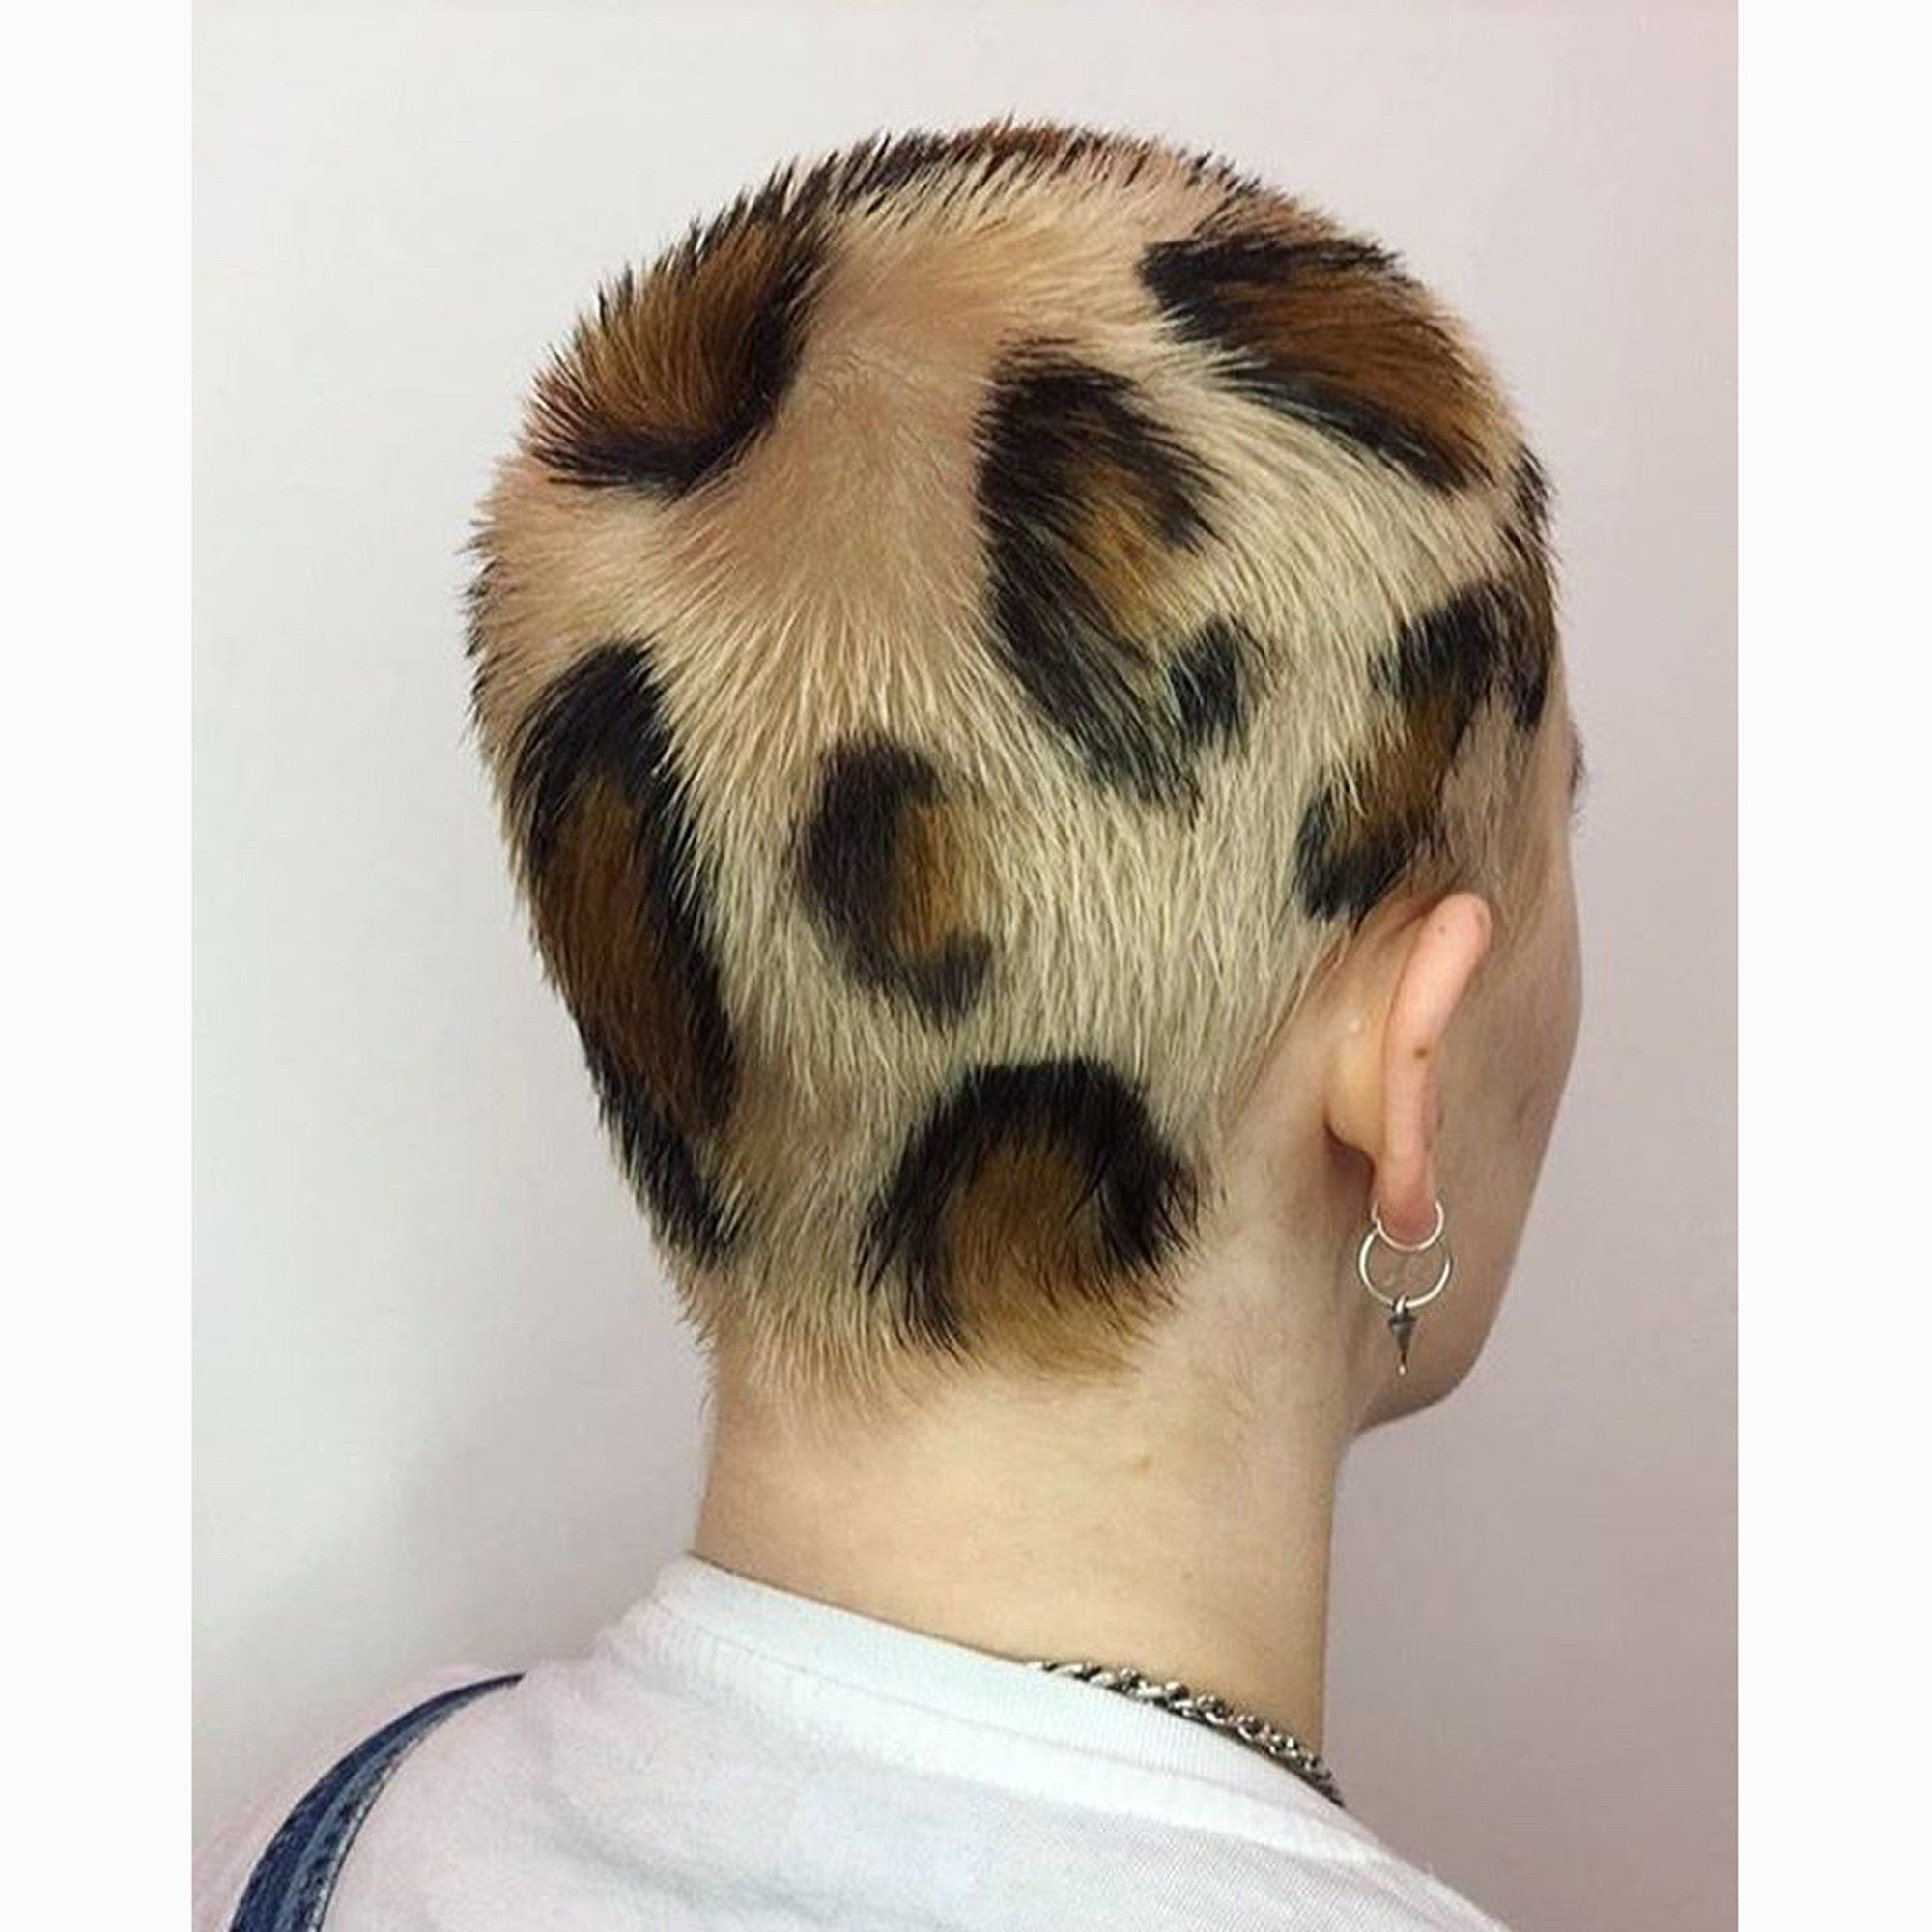 The 26 Wildest Dye Jobs That Will Inspire Your Next Hair Transformation Shaved Hair Designs Best Hair Dye Buzzed Hair Women